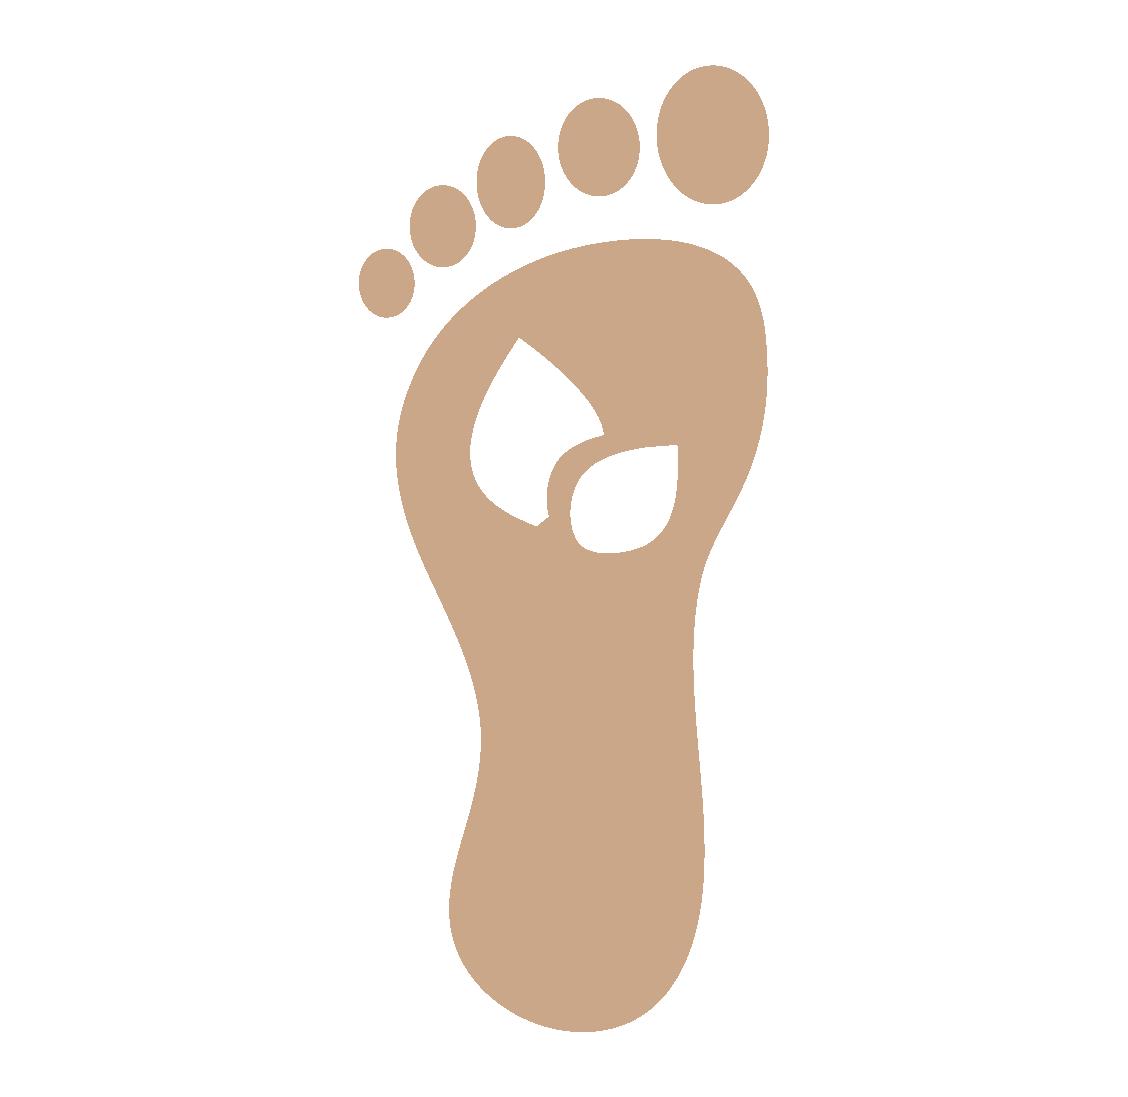 Renewable Footprint icon